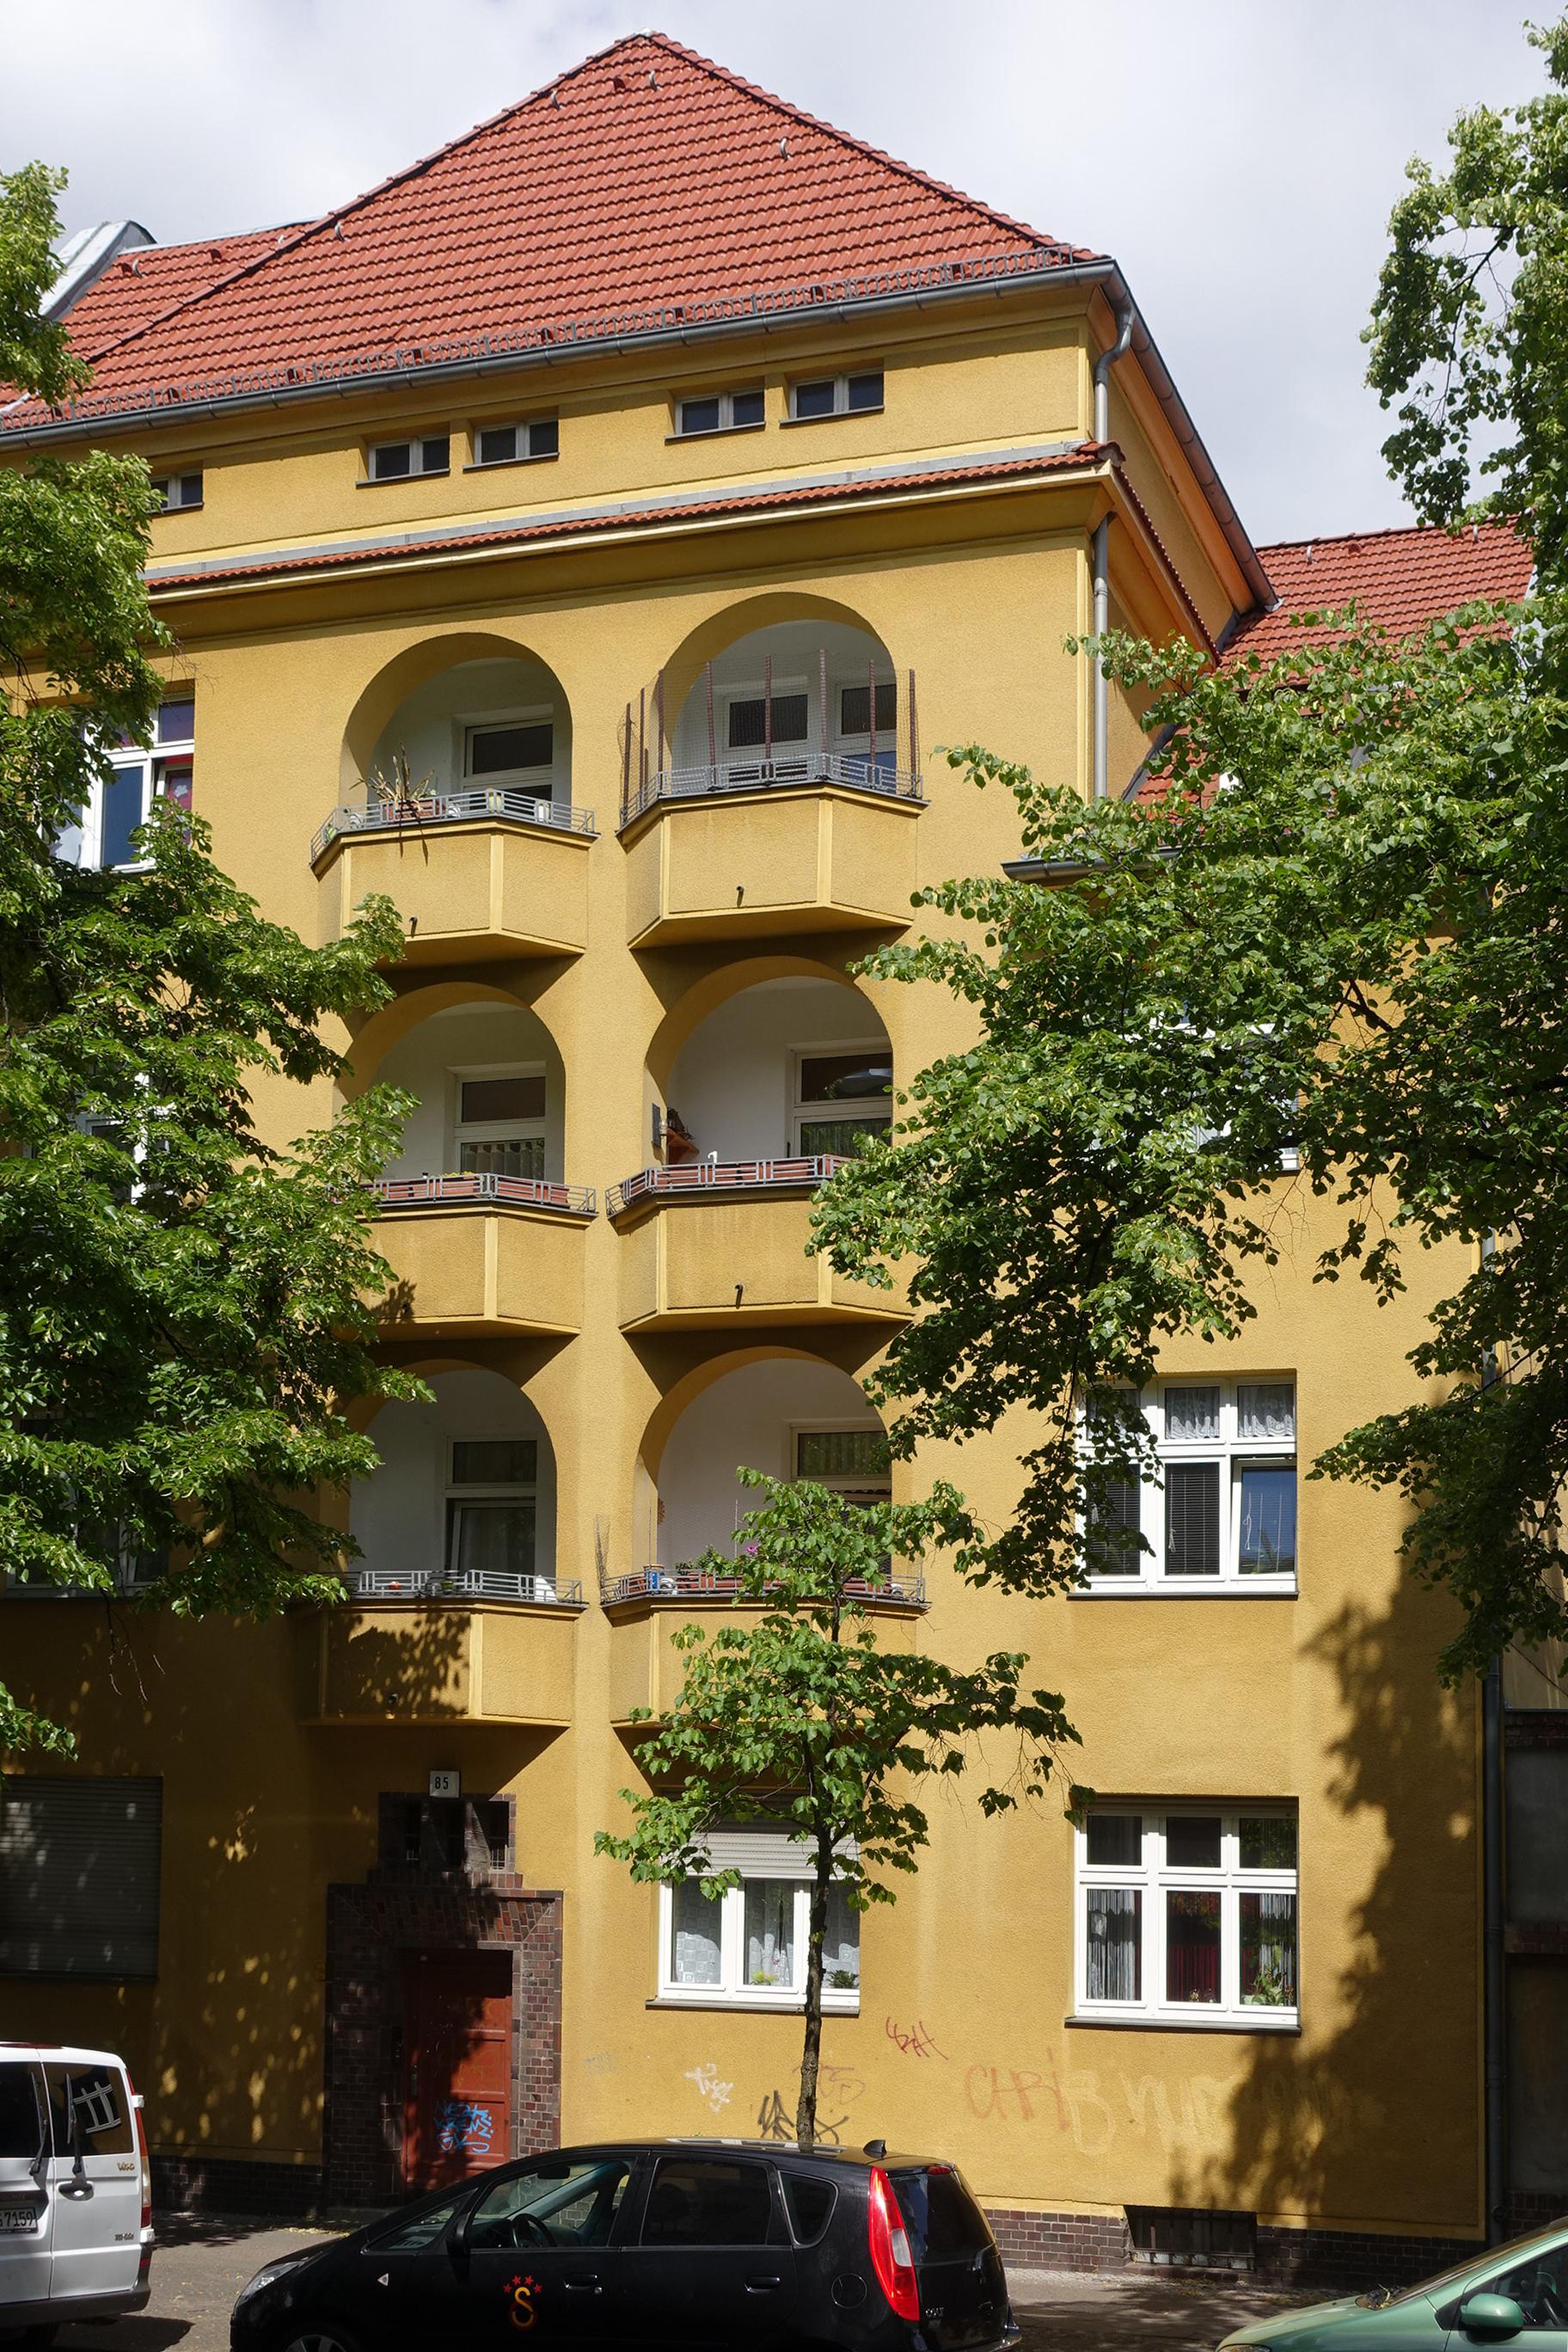 file friedrich wilhelm stra e 85 berlin reinickendorf jpg wikimedia commons. Black Bedroom Furniture Sets. Home Design Ideas